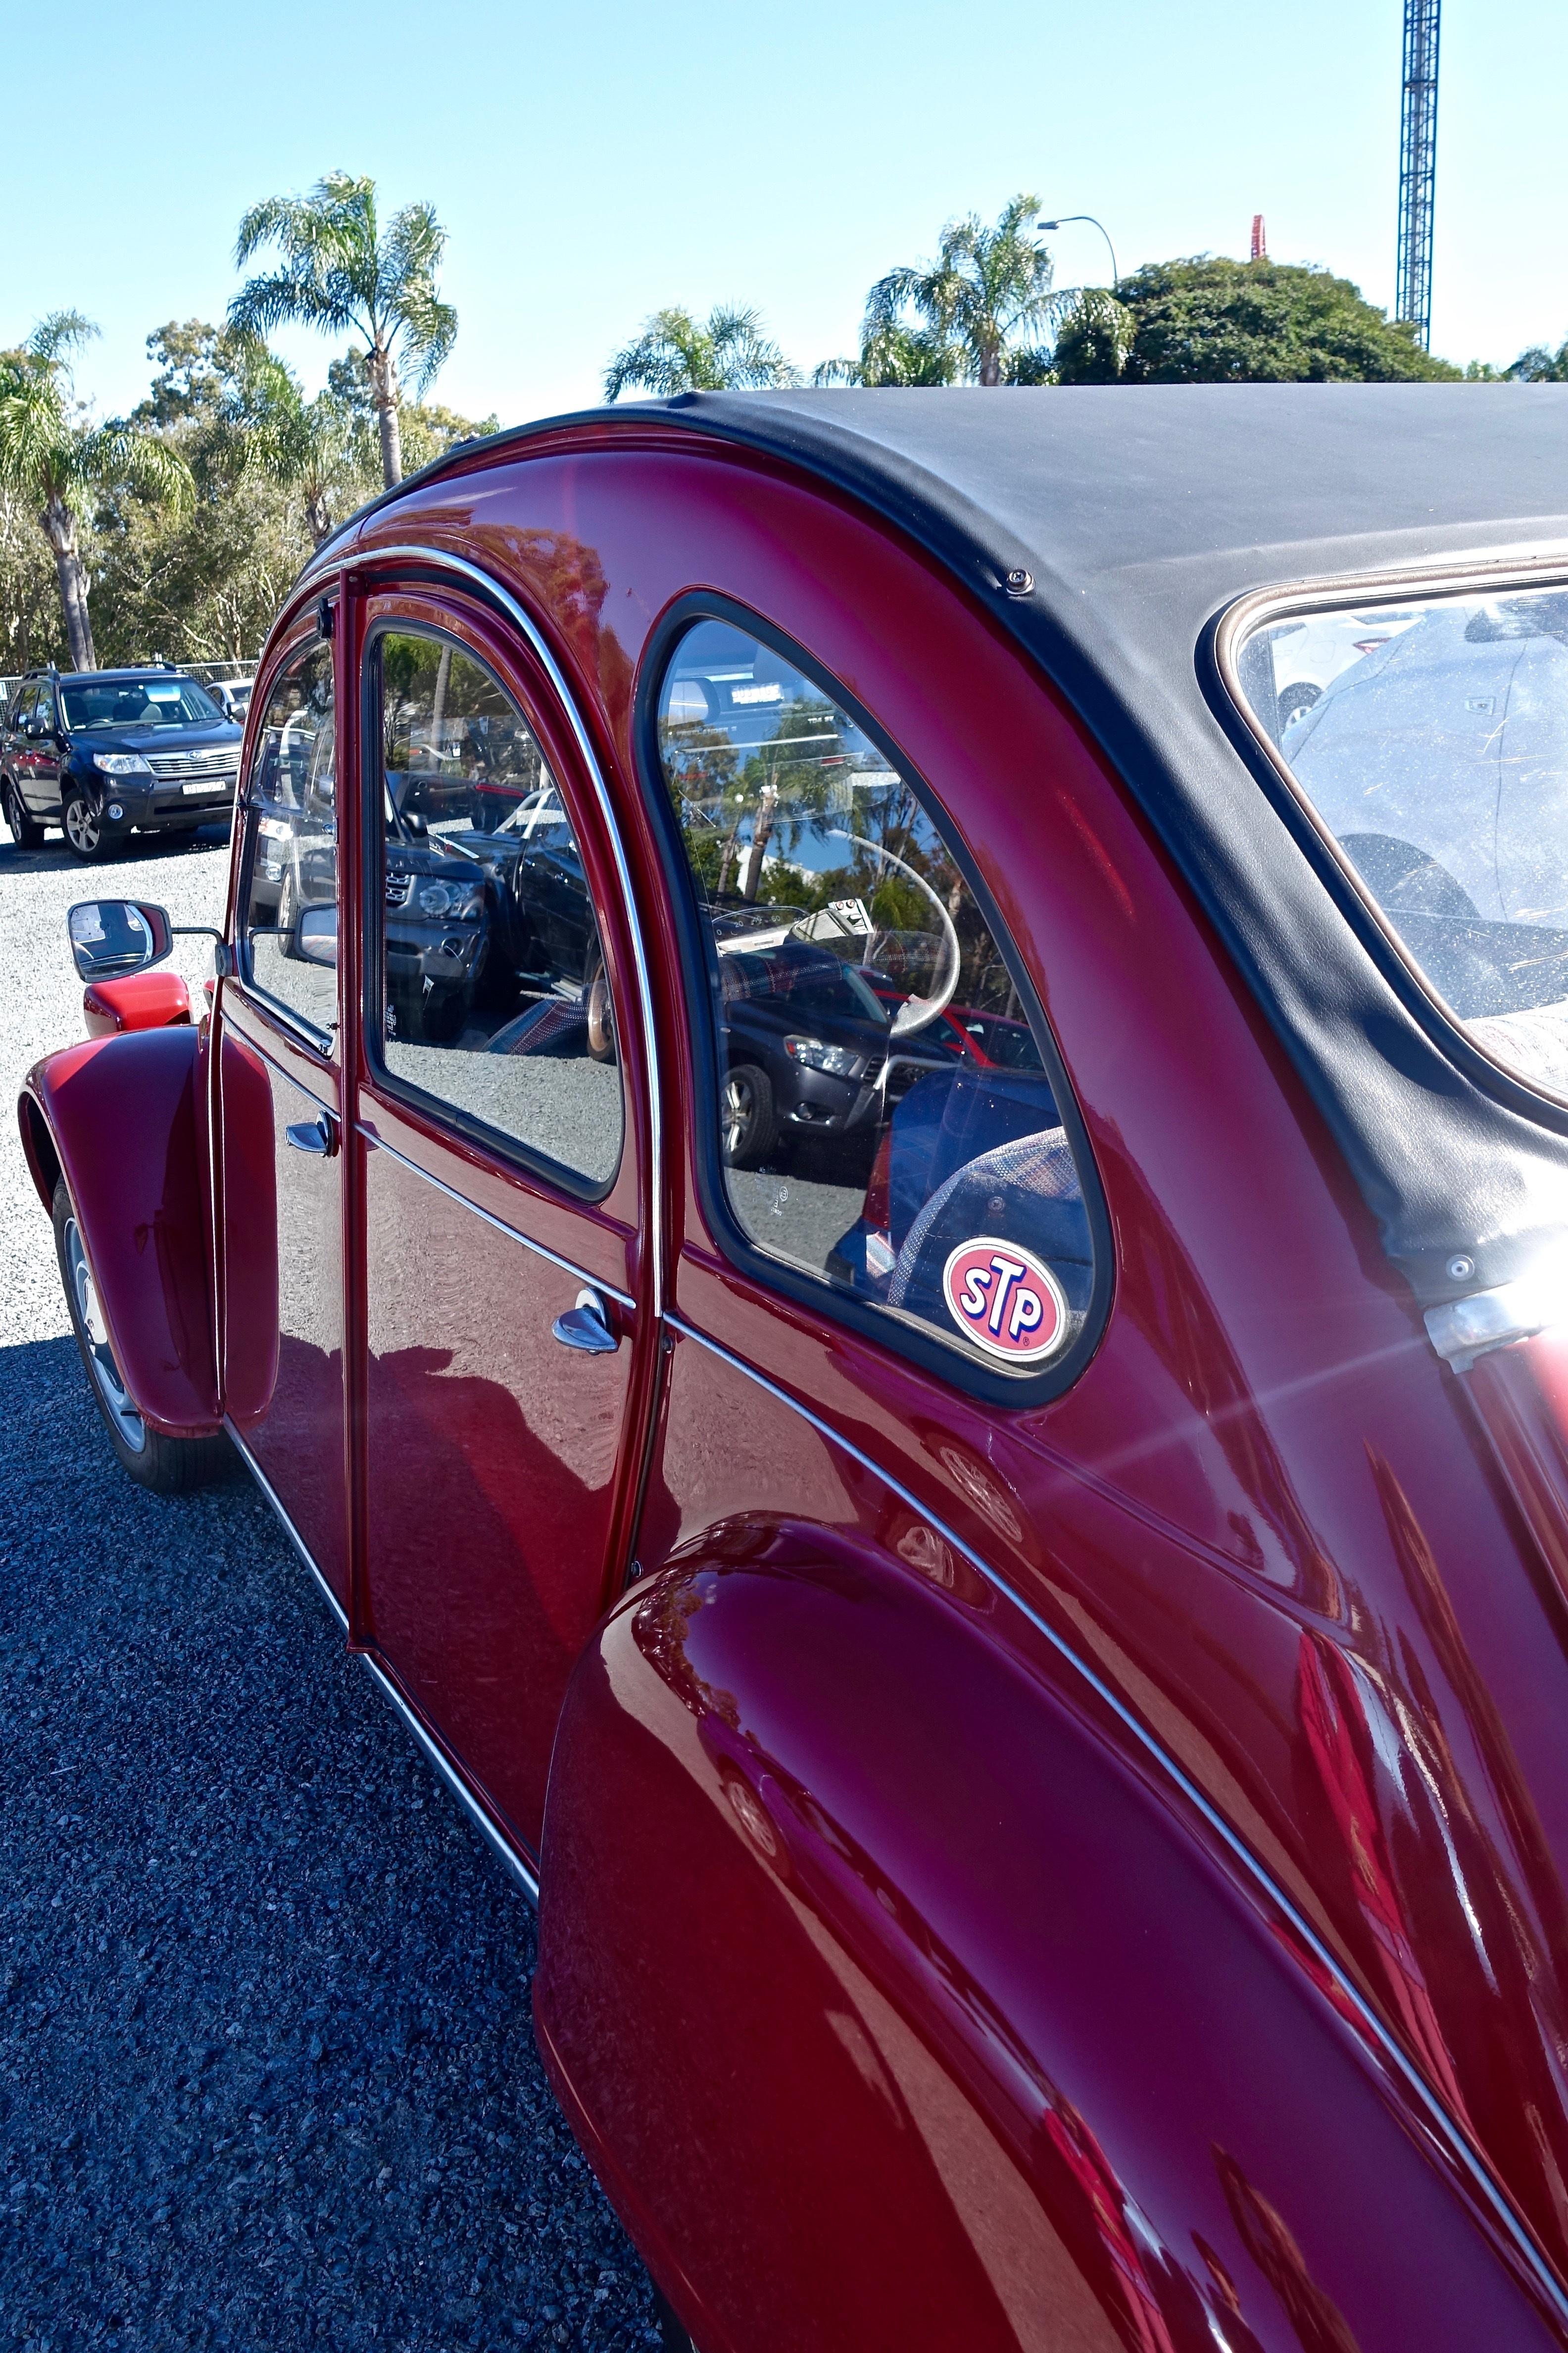 Free Images : wheel, motor vehicle, vintage car, vintage cars, old ...